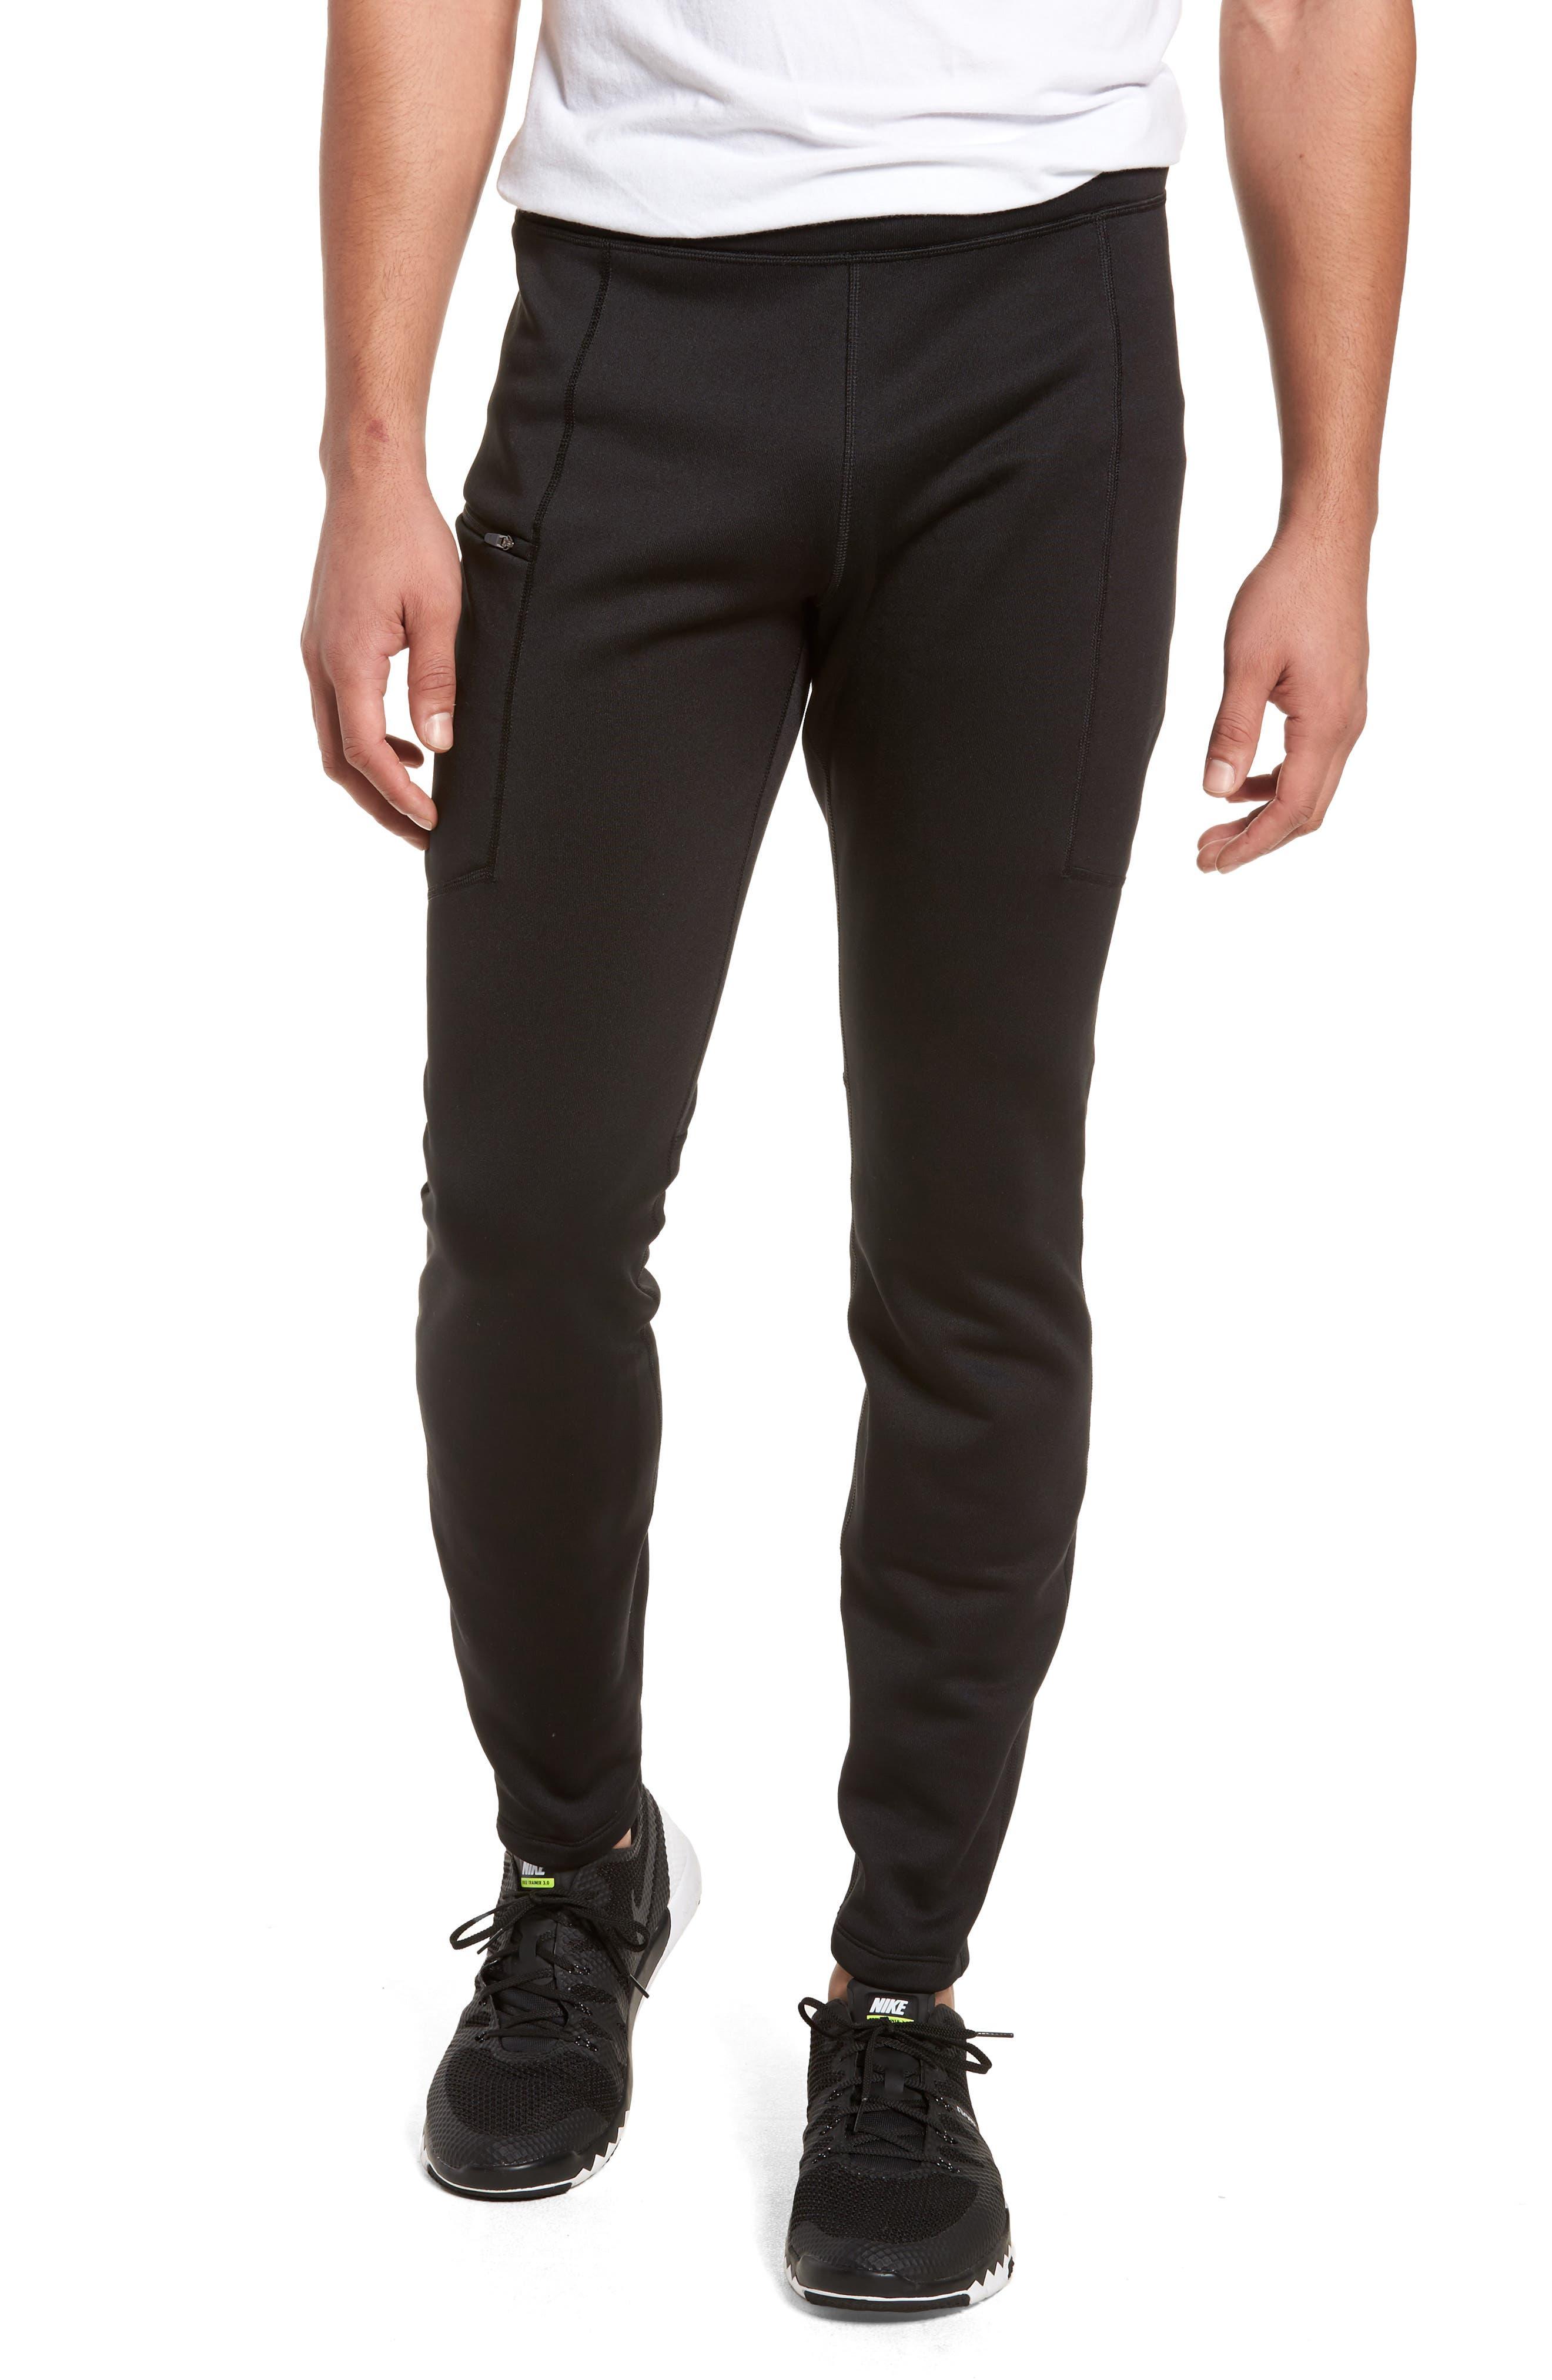 Patagonia Crosstrek Pants, Black